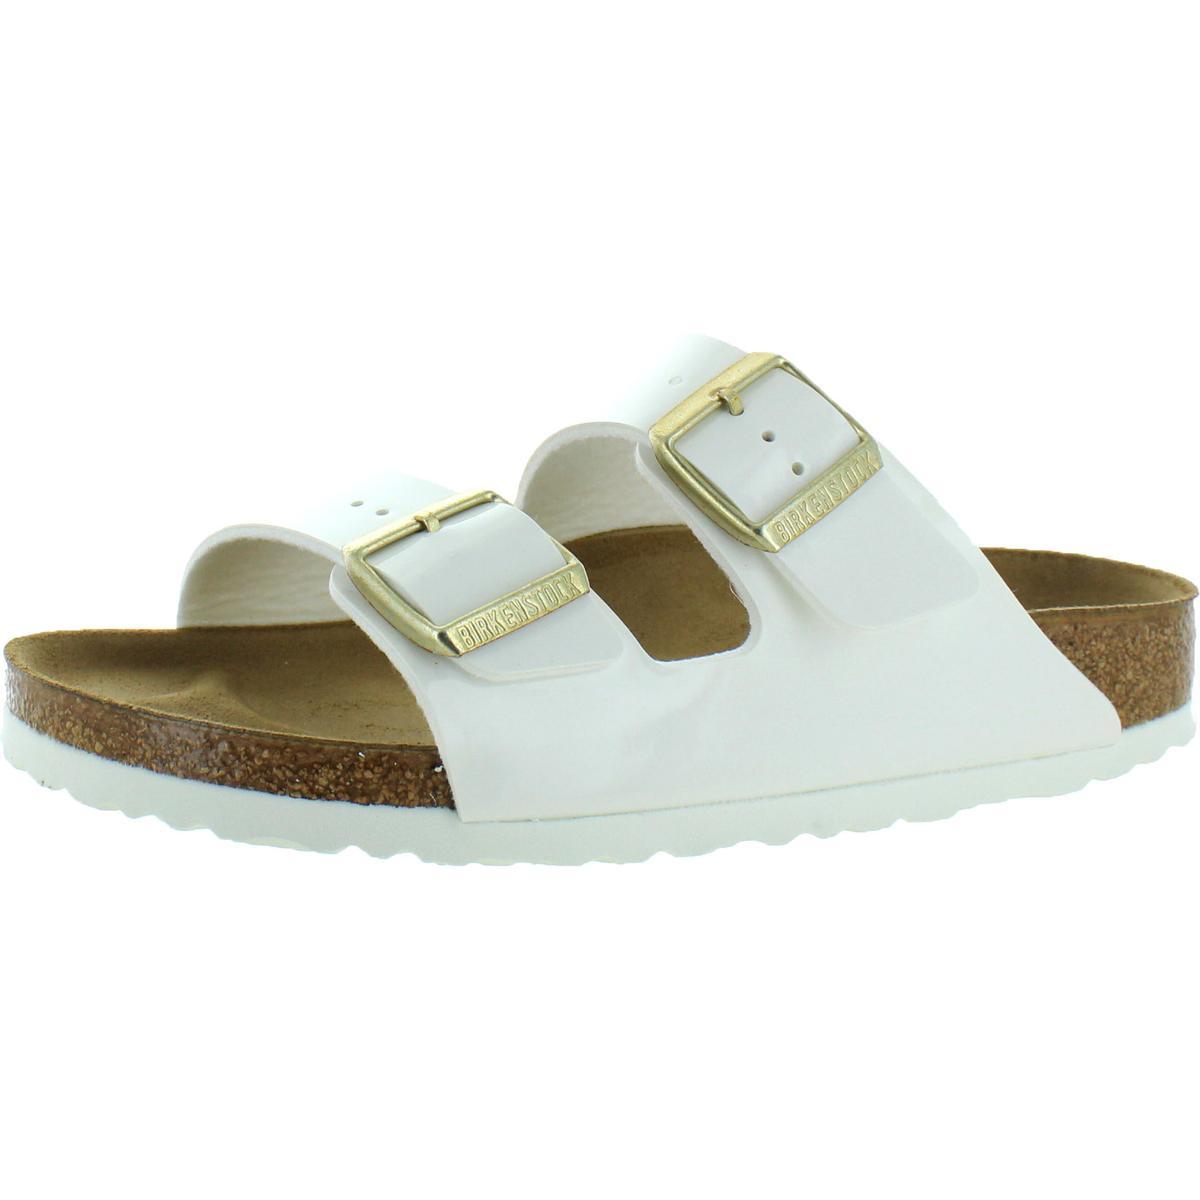 Women's Birkenstock Shoes 8 Narrow (AA, N)